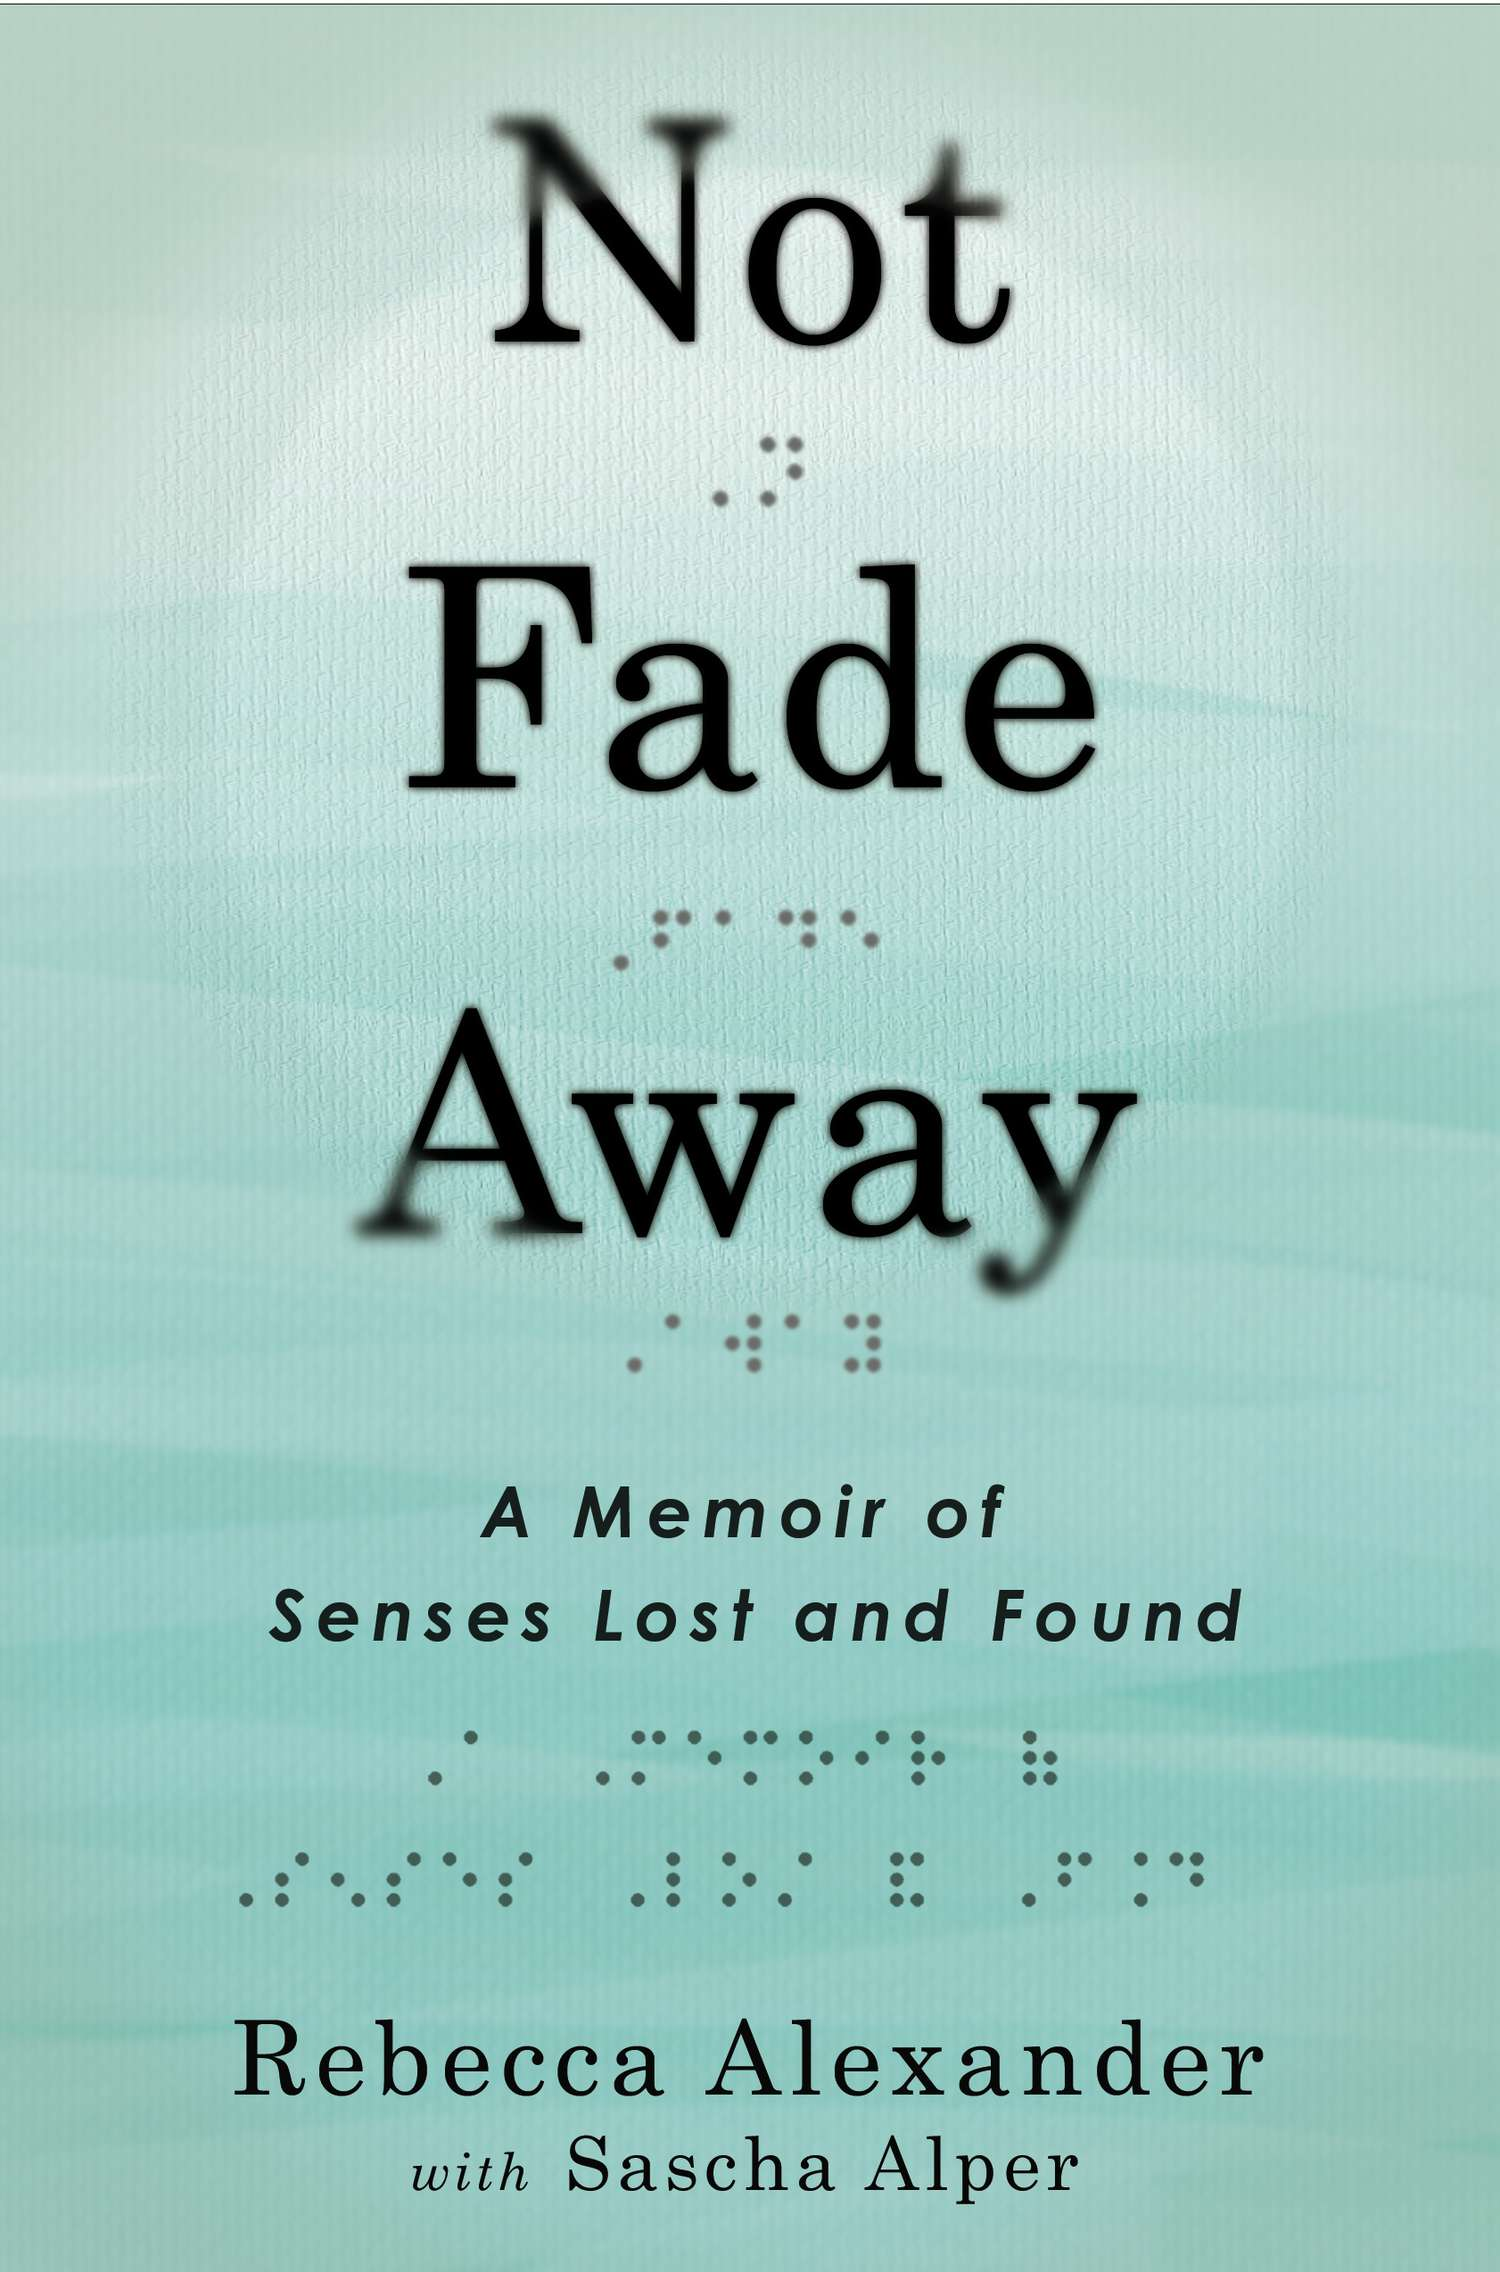 Book Launch: Not Fade Away by Rebecca Alexander